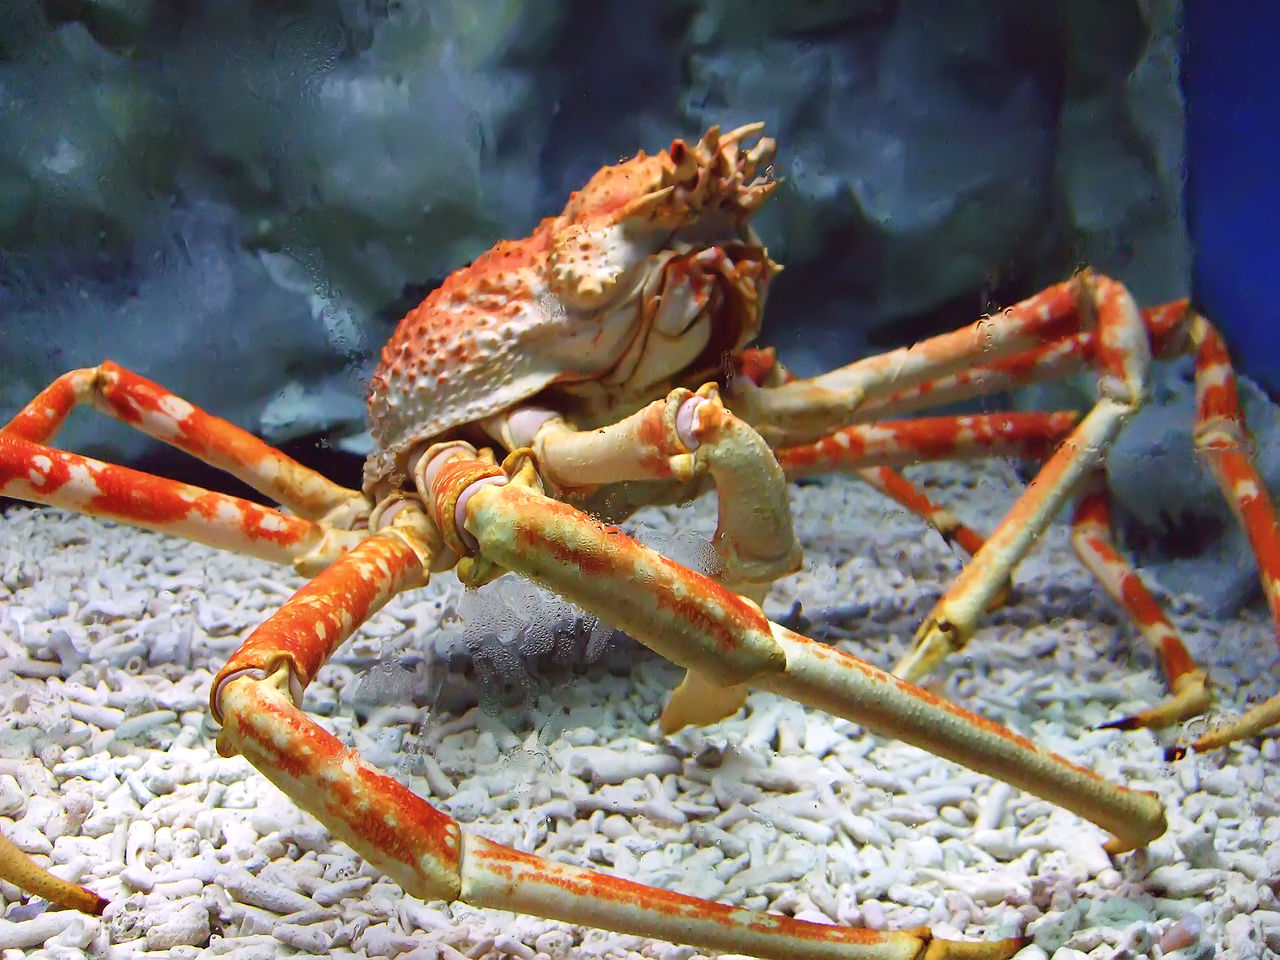 File:Spider crab at manila ocean park.jpg - Wikimedia Commons